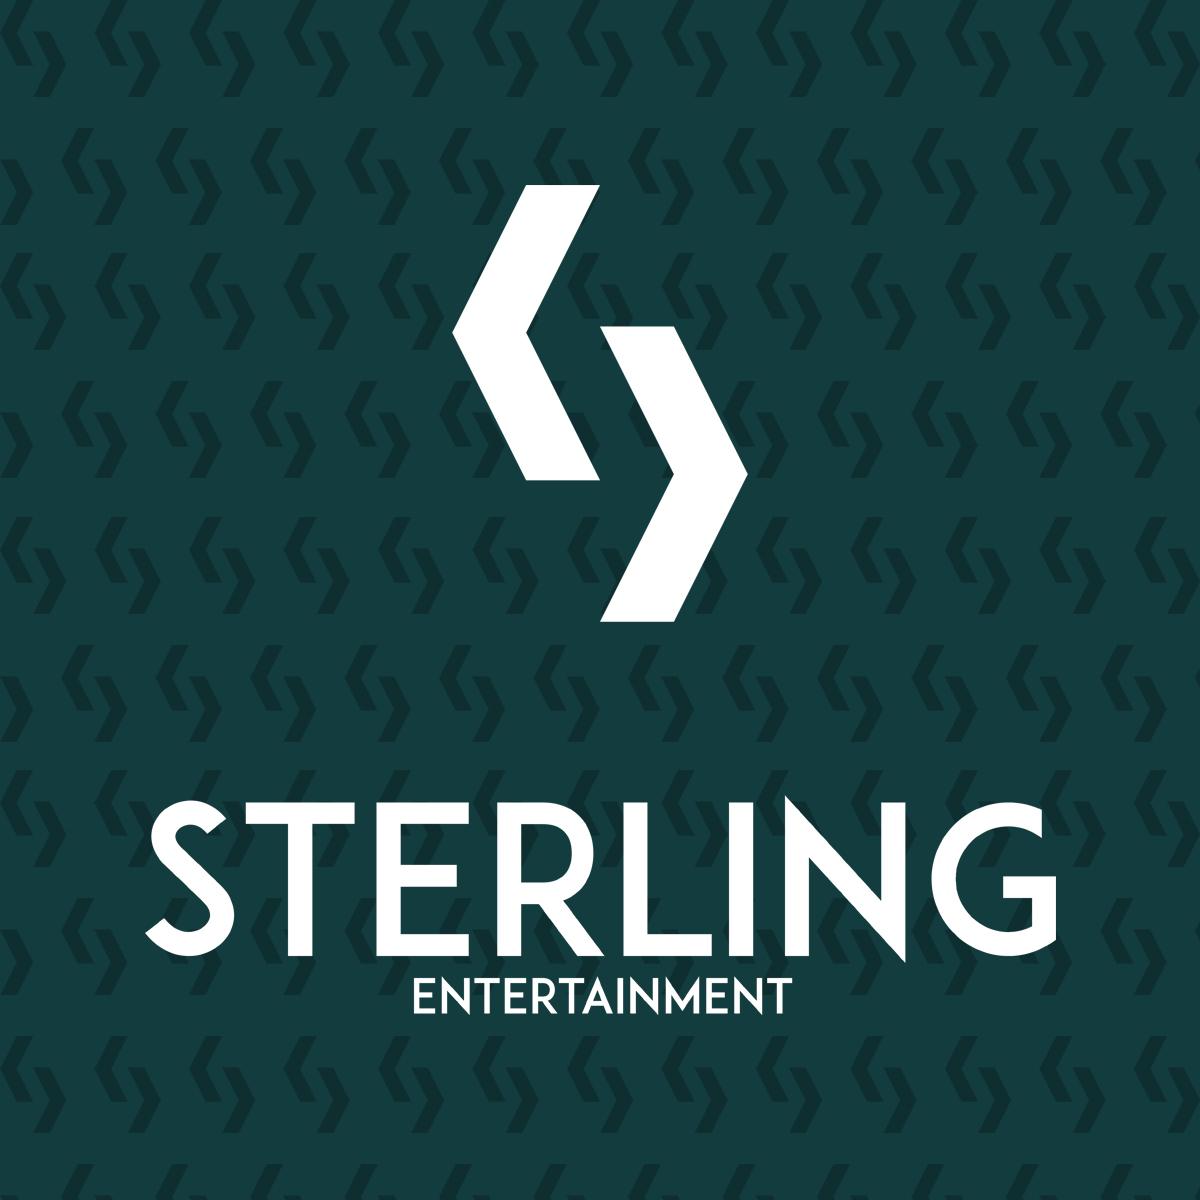 branding-creative-agency-logo design-community-marketing-web design-social media-business cards-sterling entertainment-print design